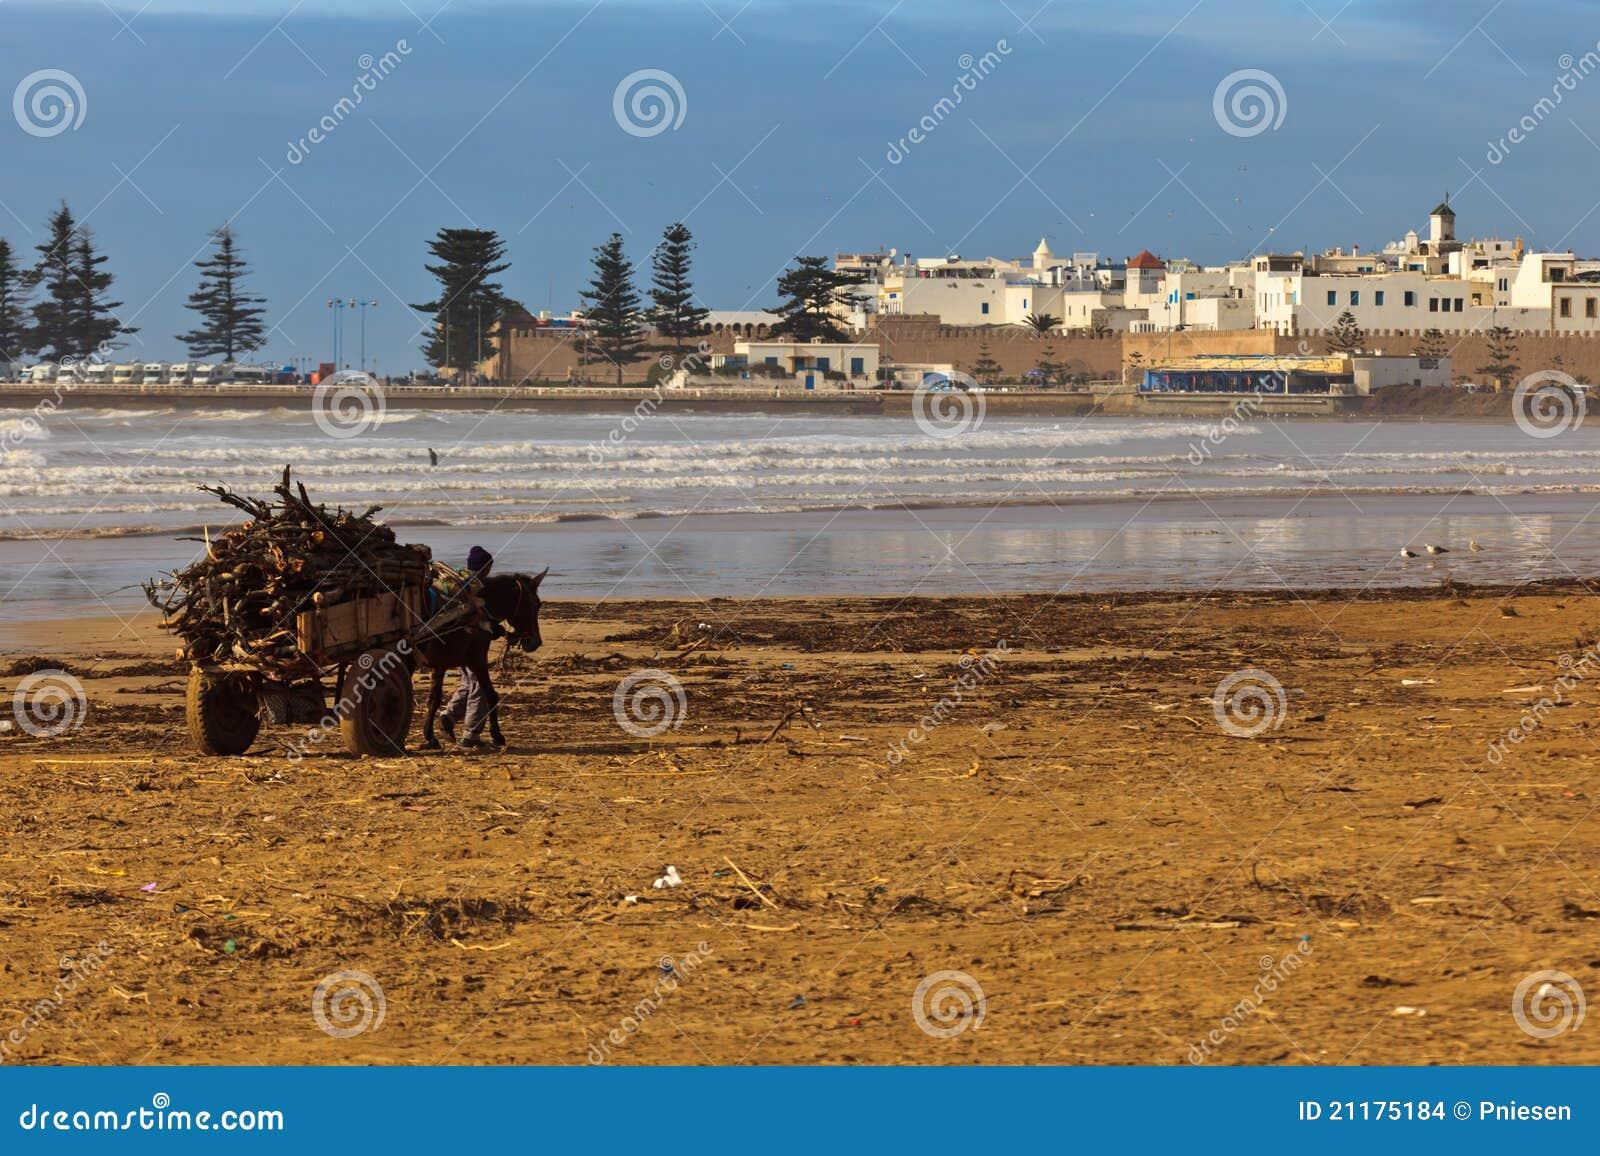 Man leading donkey cart across beach